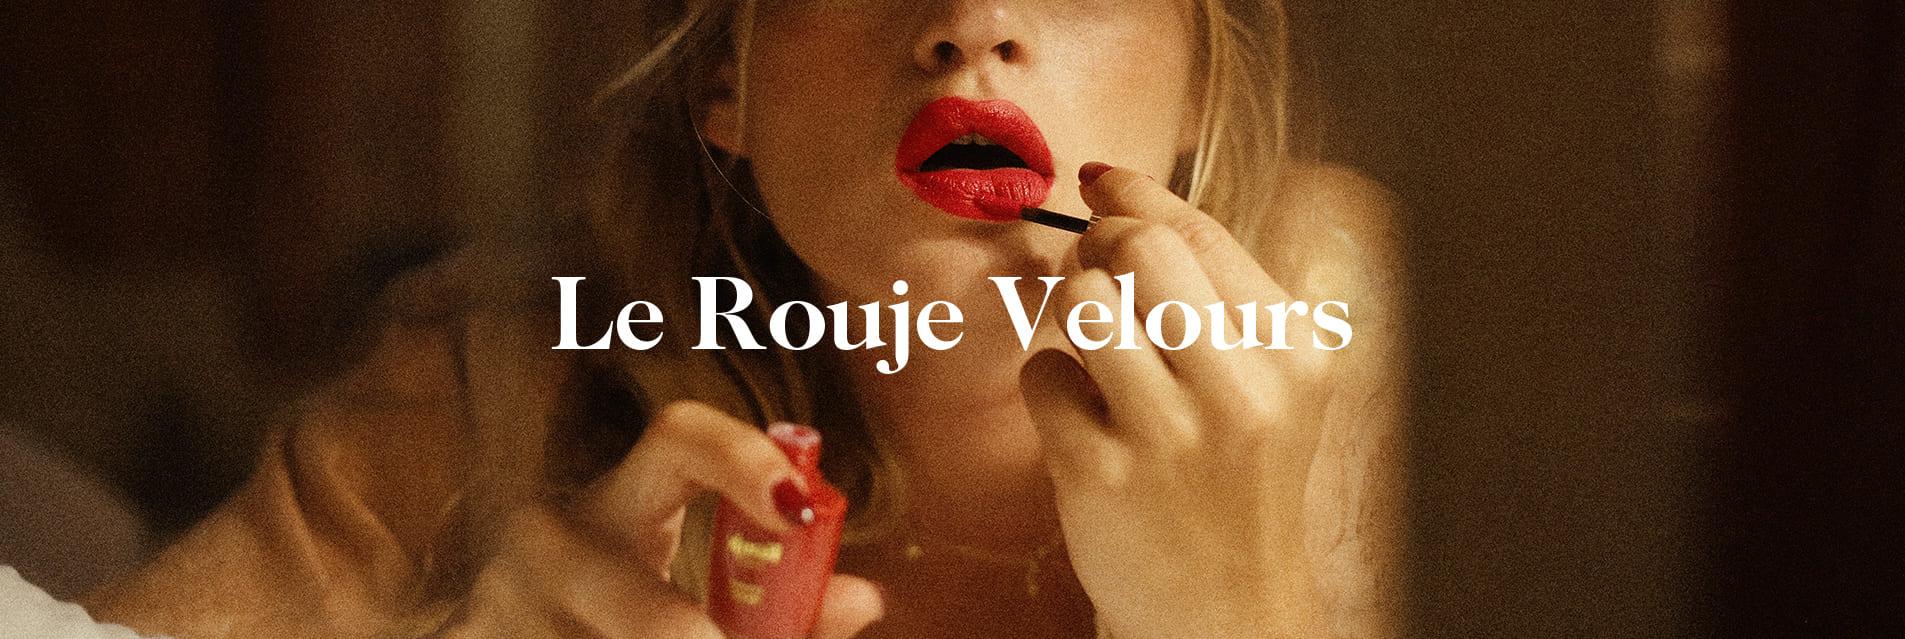 Le Rouje Velours